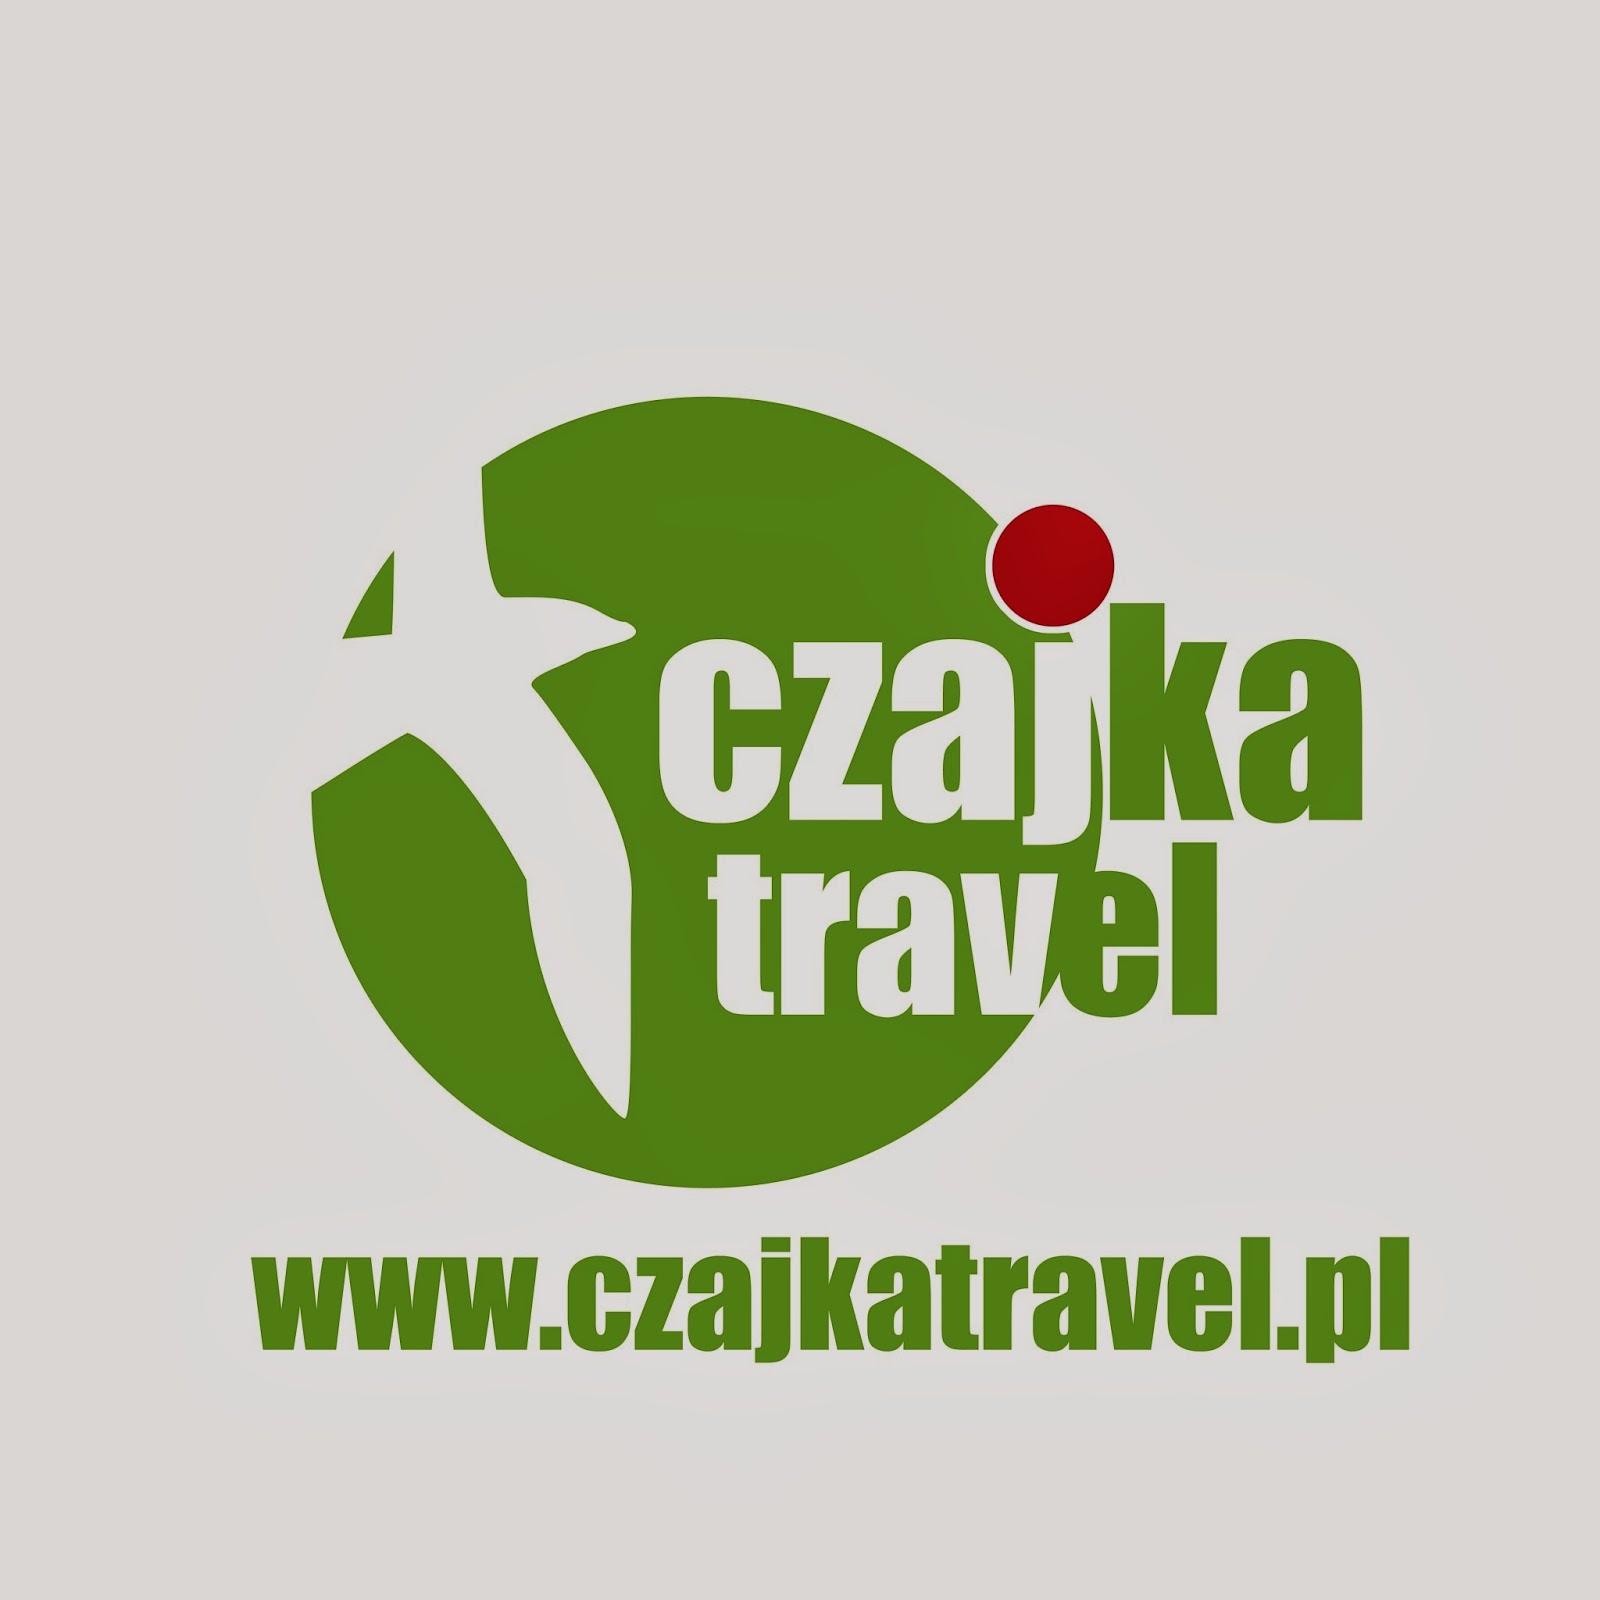 http://czajkatravel.pl/